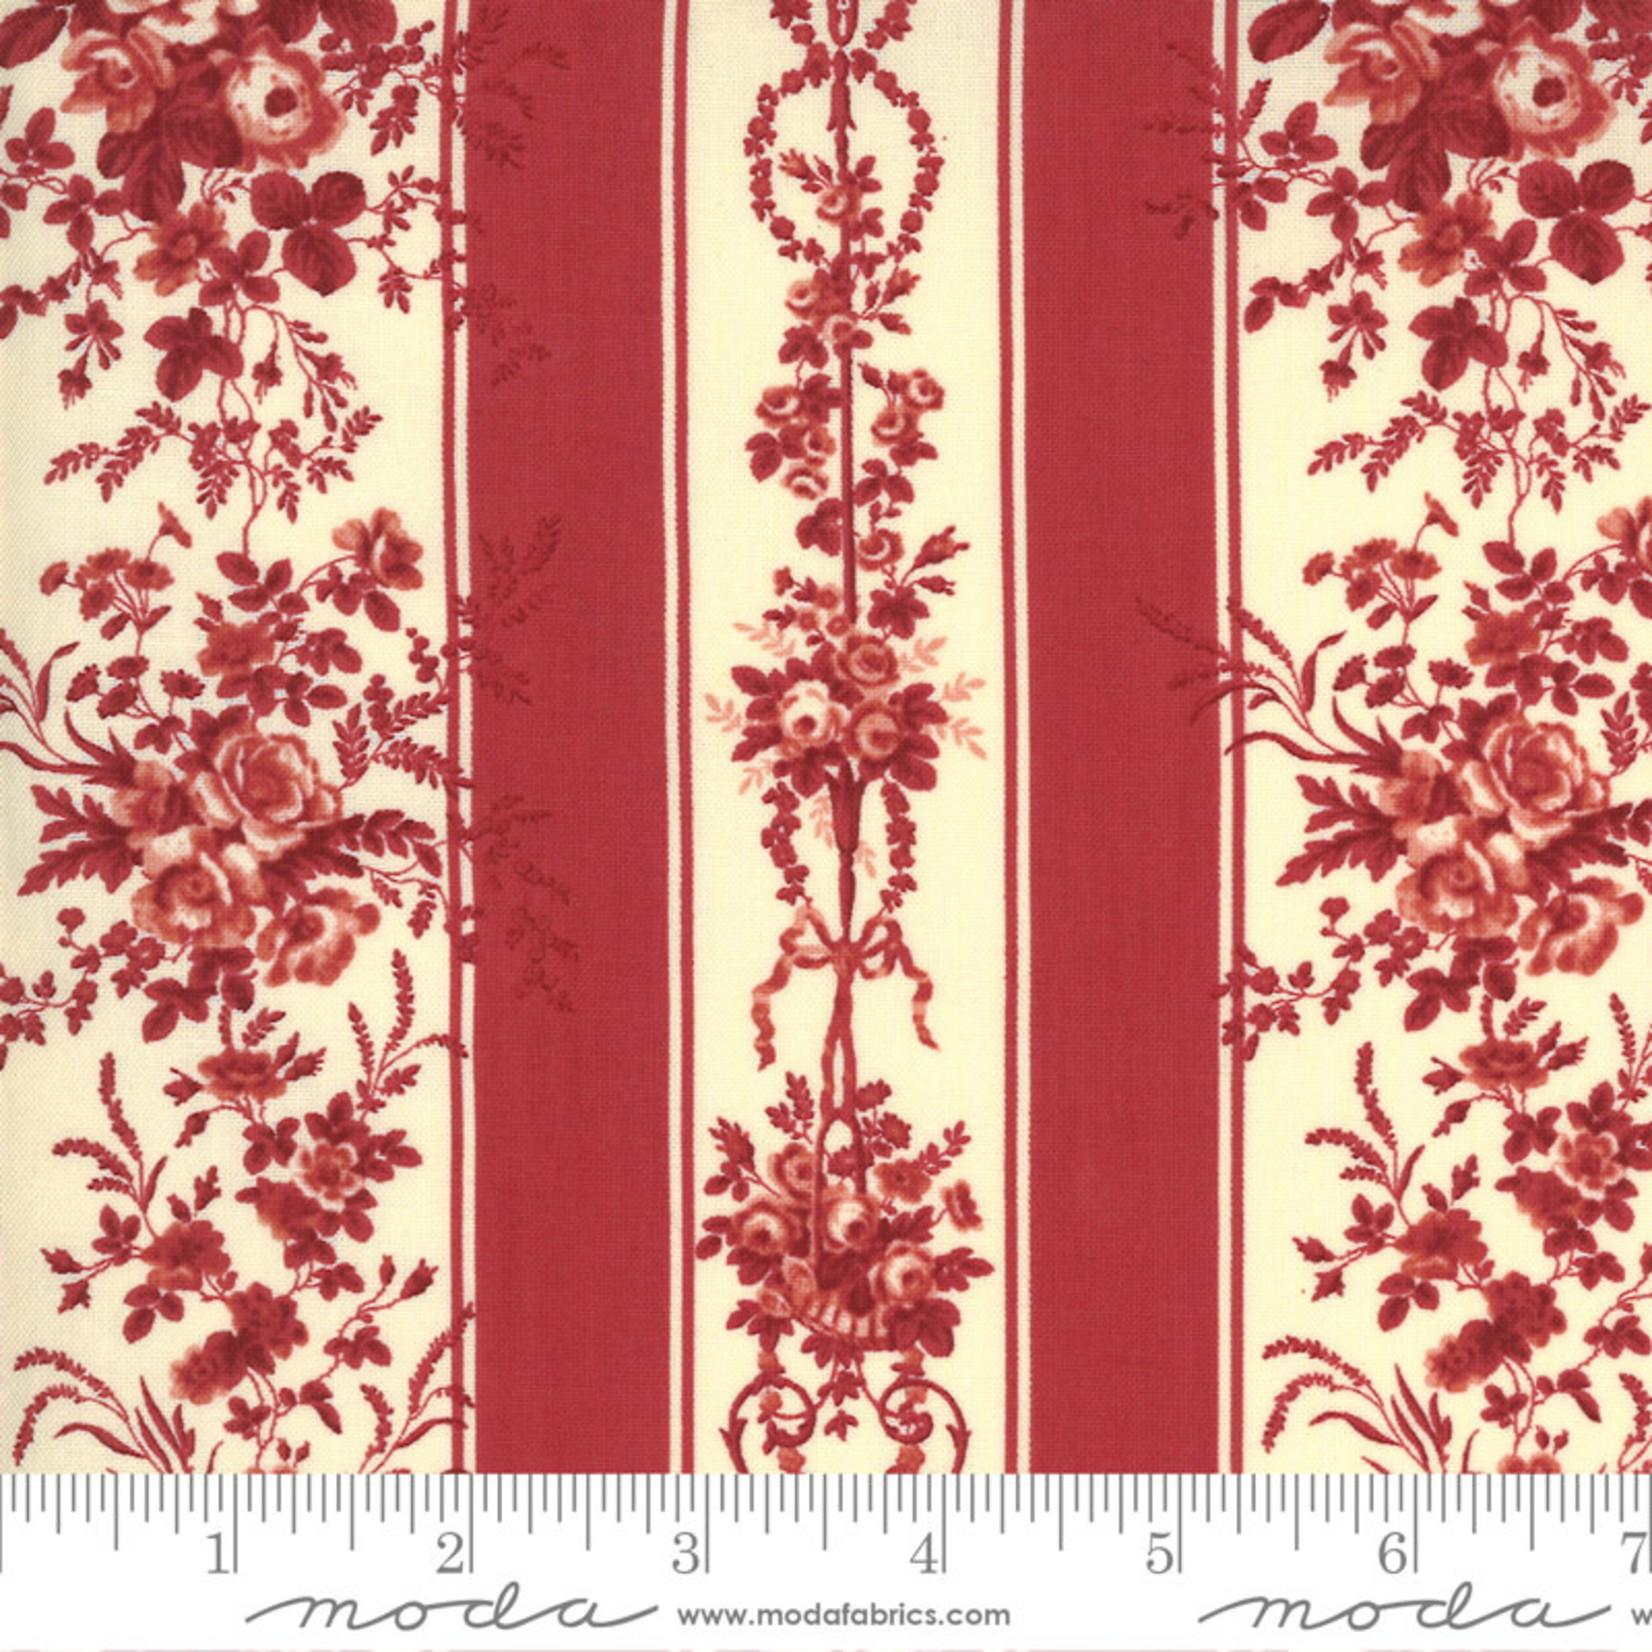 FRENCH GENERAL Jardins De Fleurs, Trocadero, Rouge 13891-11 $0.20 per cm or $20/m